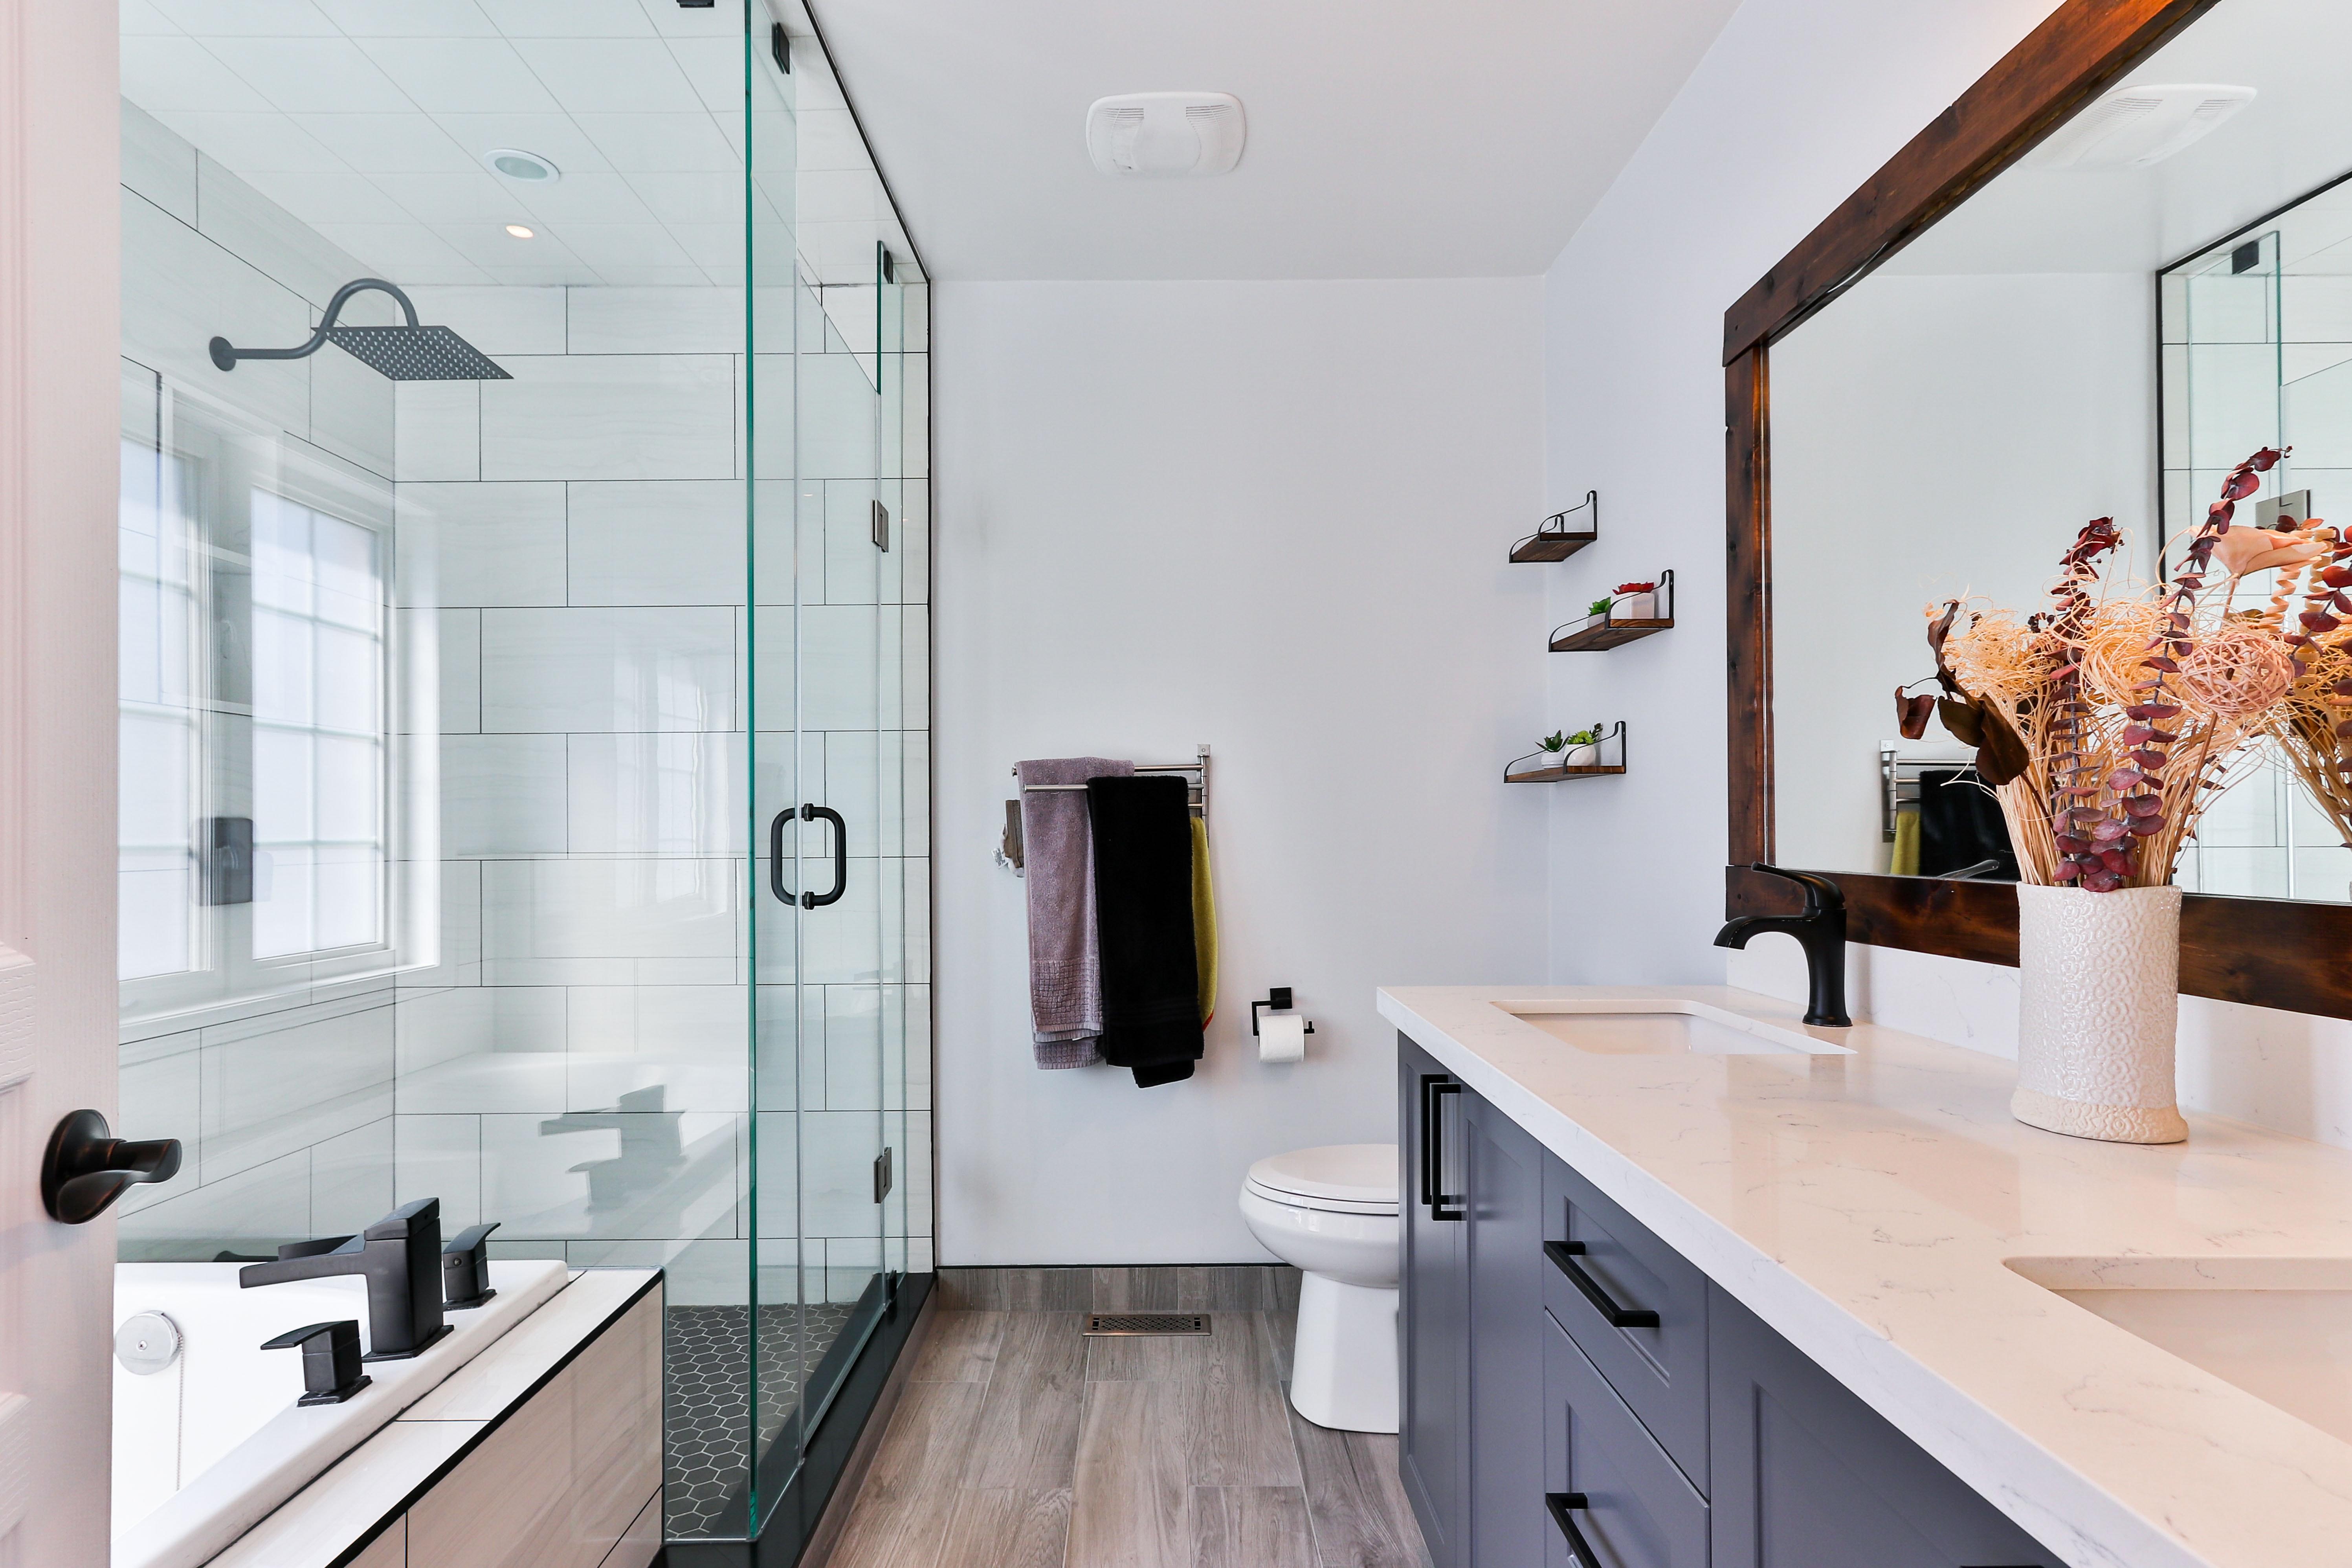 Bathroom Renovation Cost In Canada Guide 2020 2021 Renovationfind Blog